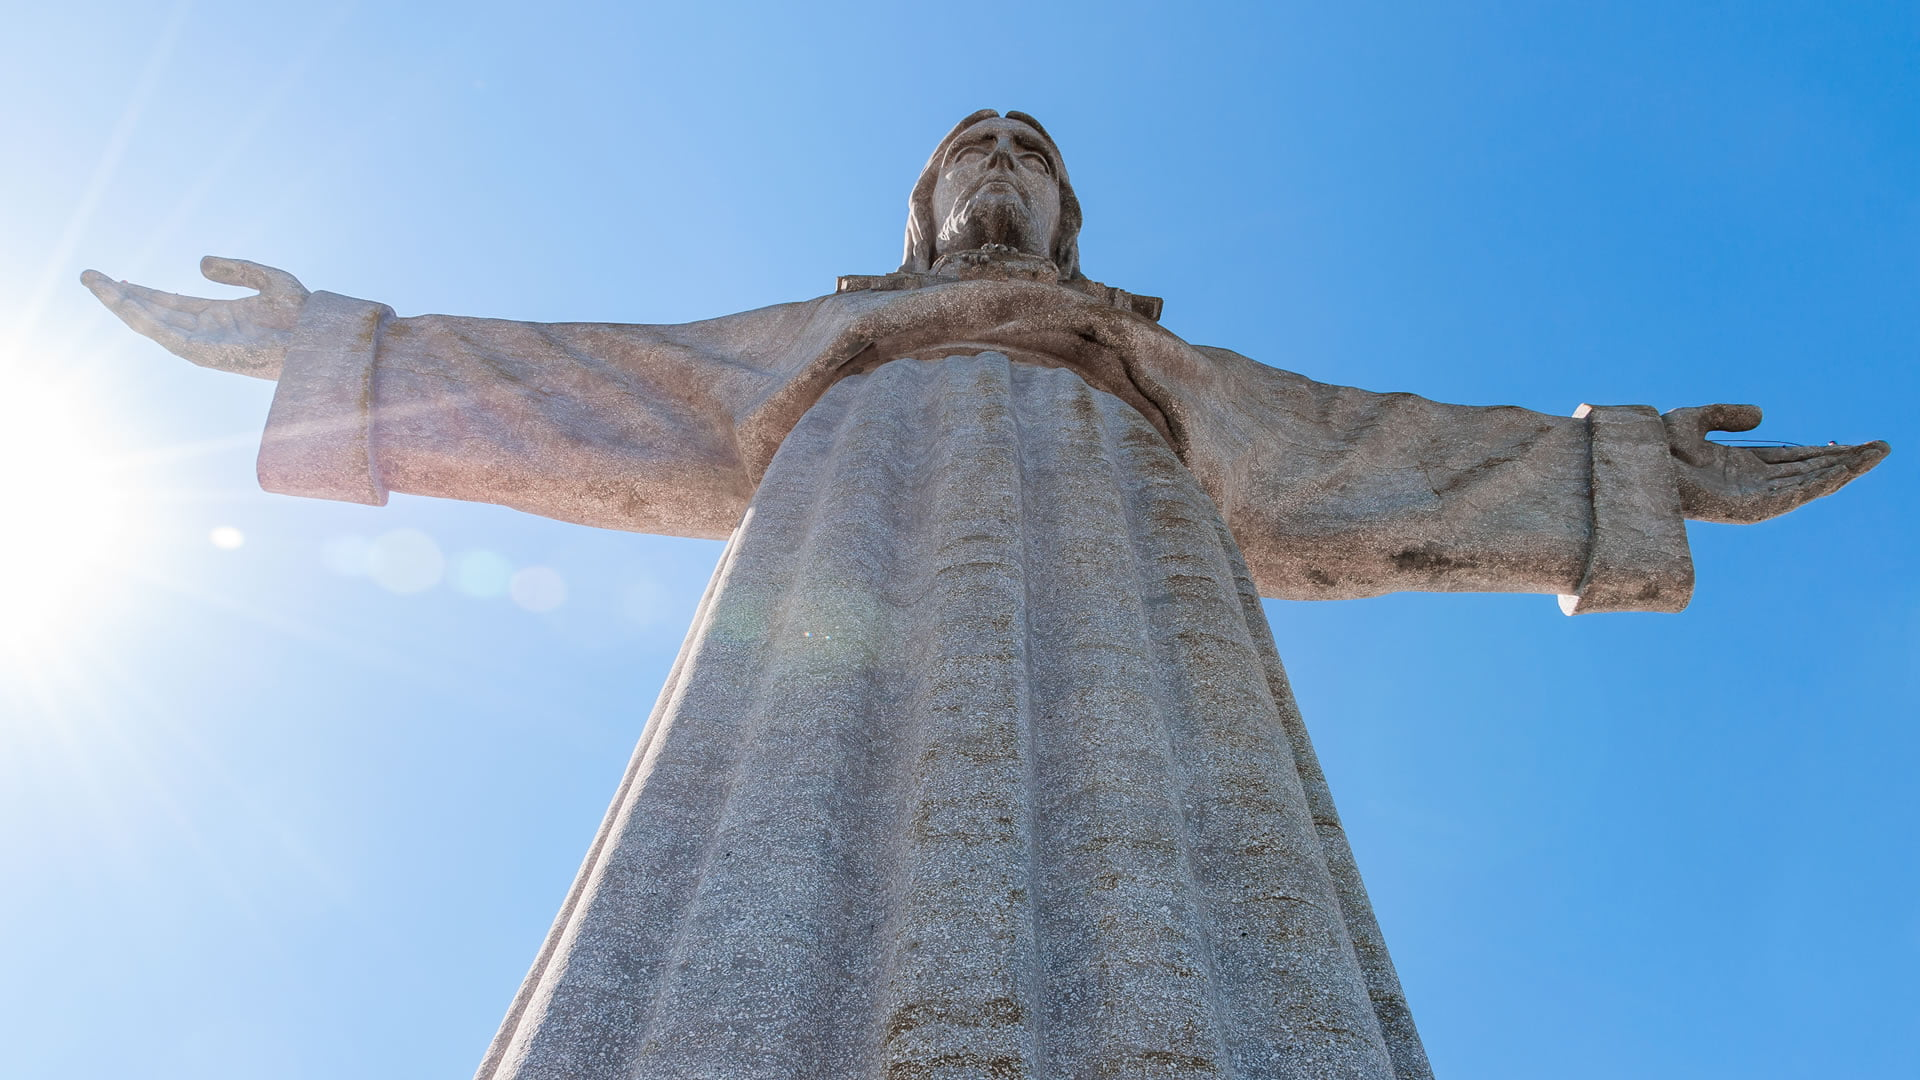 Monumento Nacional del Cristo Rey, Almada, Portugal